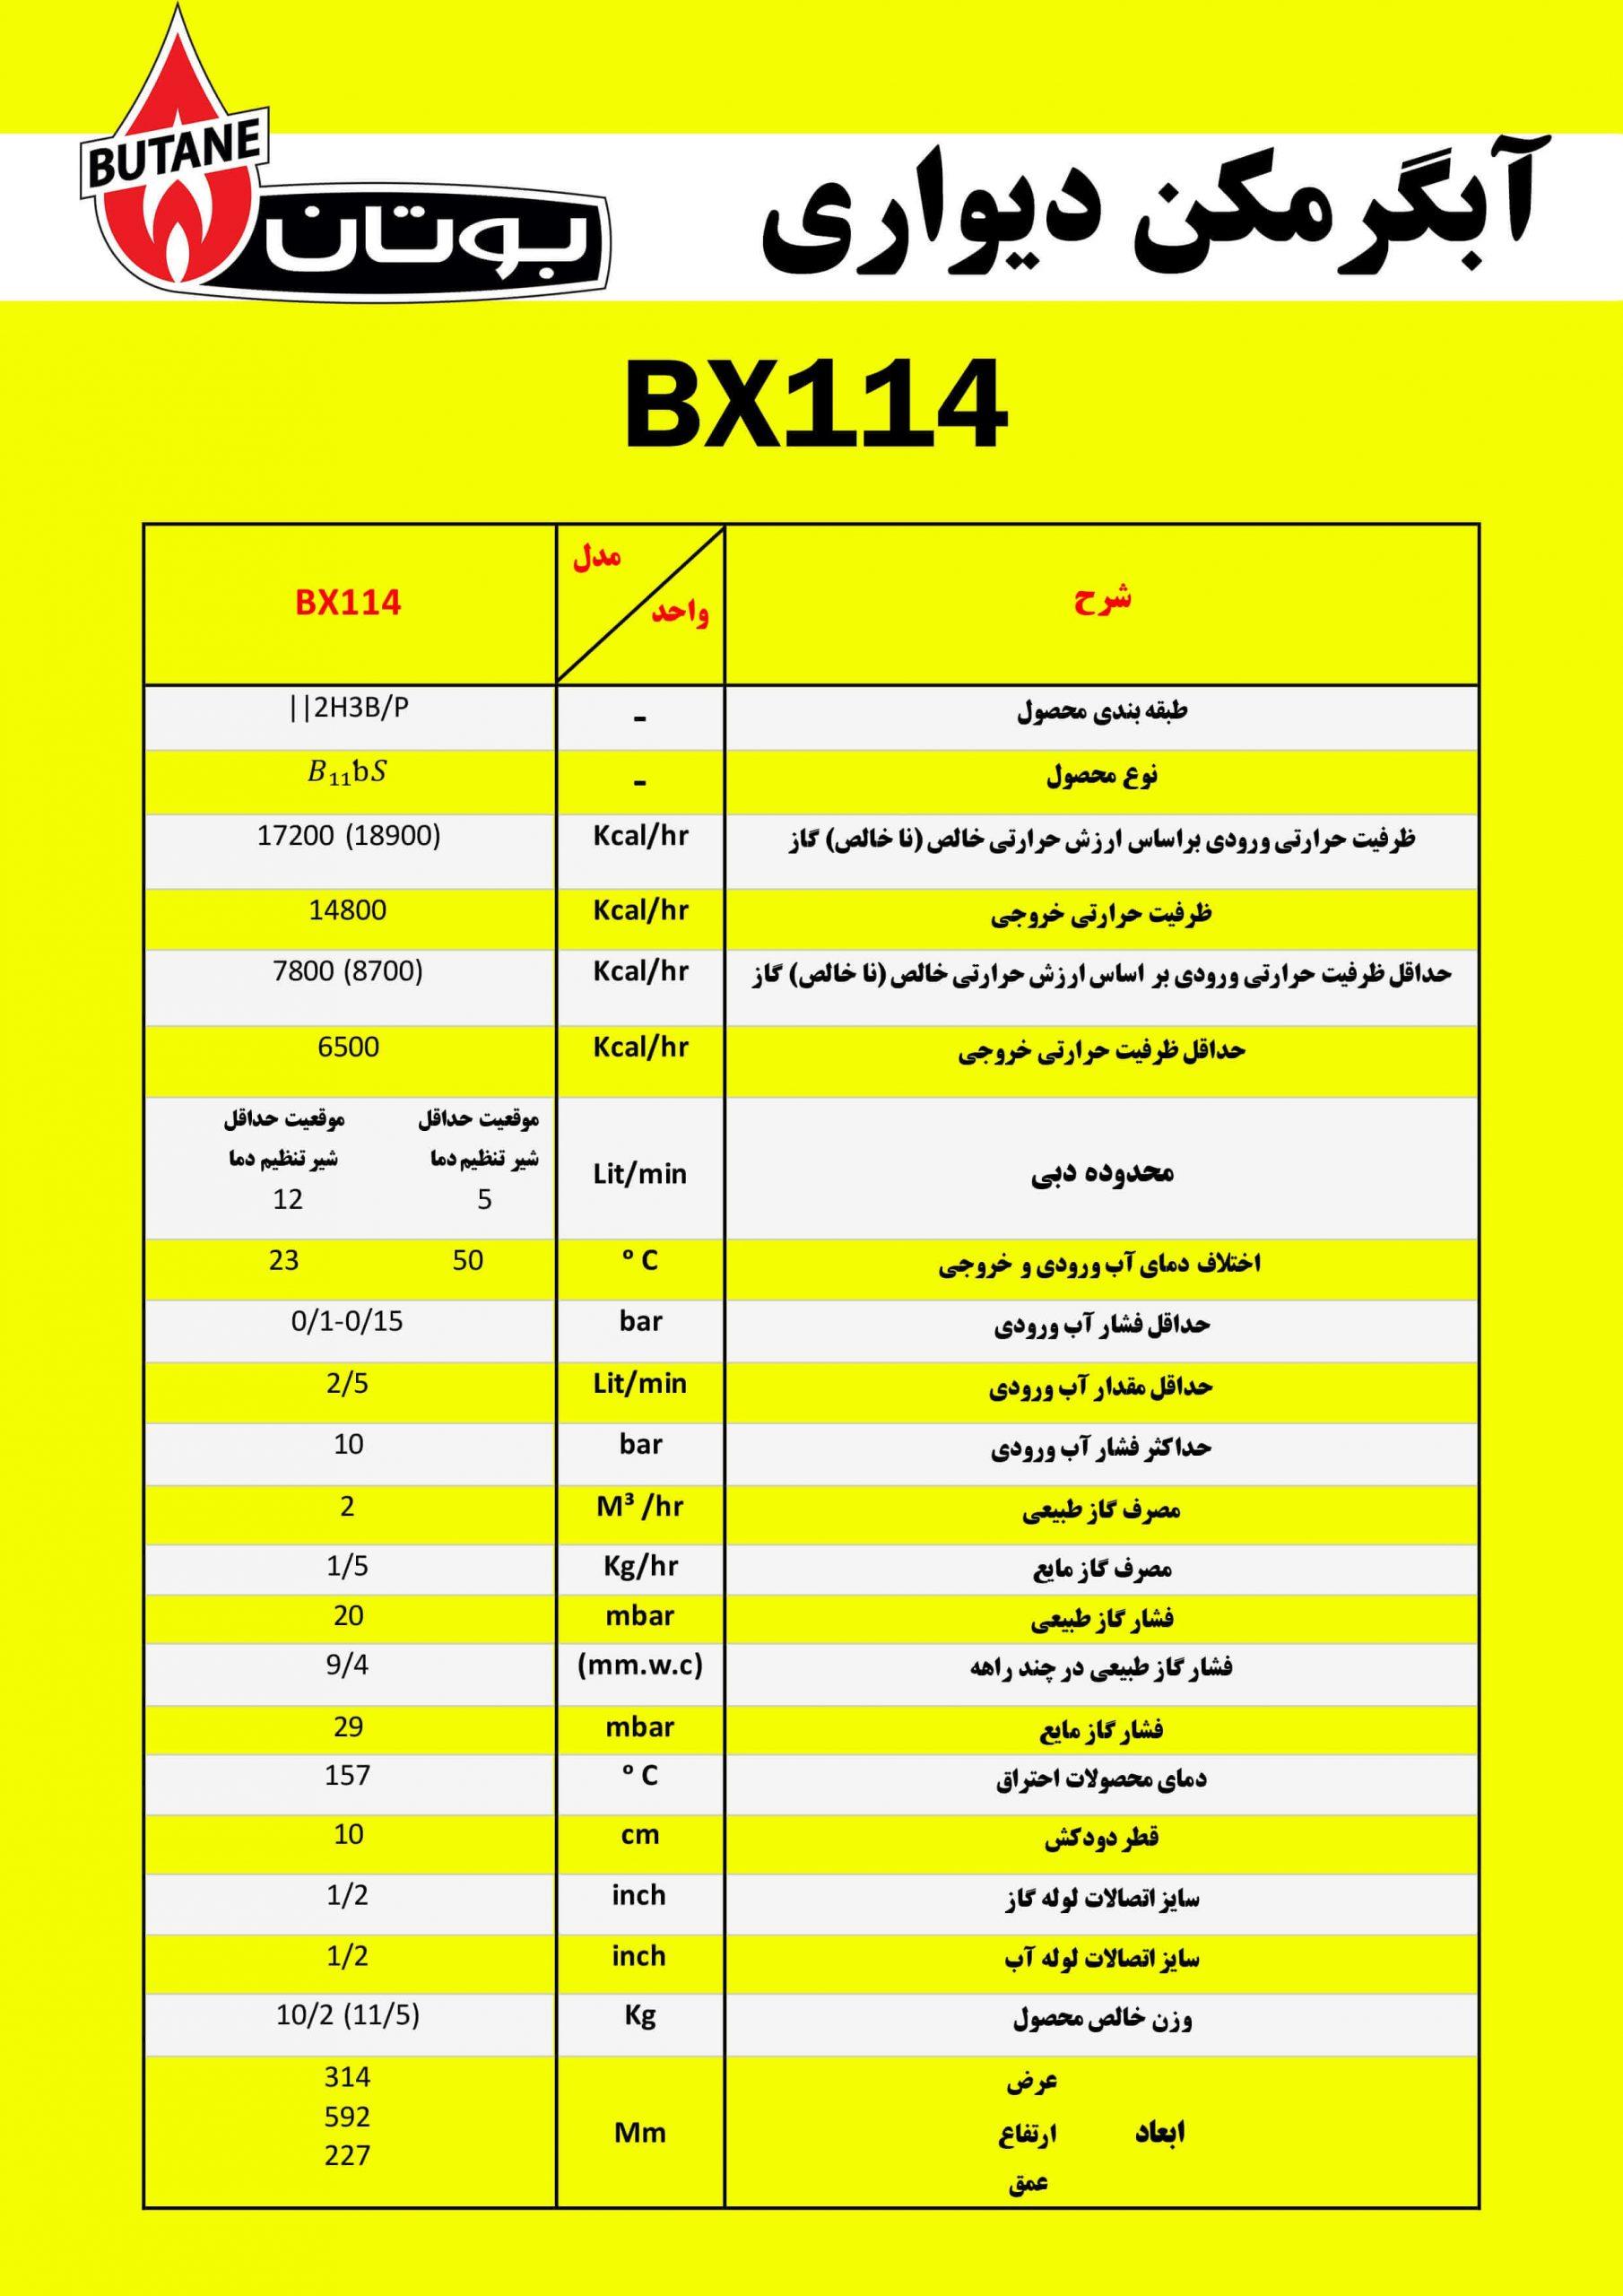 آبگرمکن دیواری بوتان مدل BX114